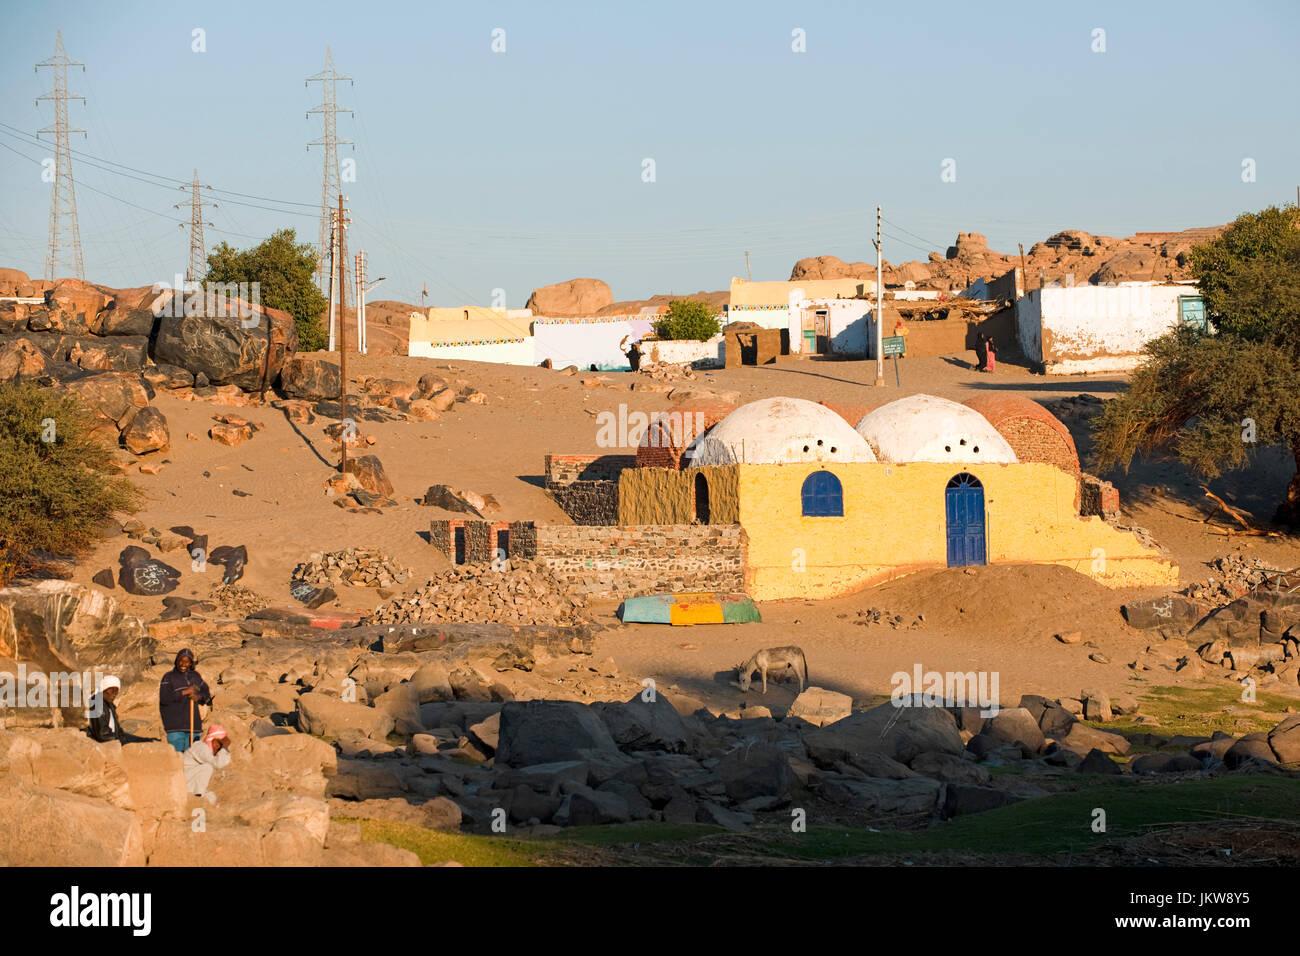 Aegypten, Assuan, nubisches Dorf - Stock Image